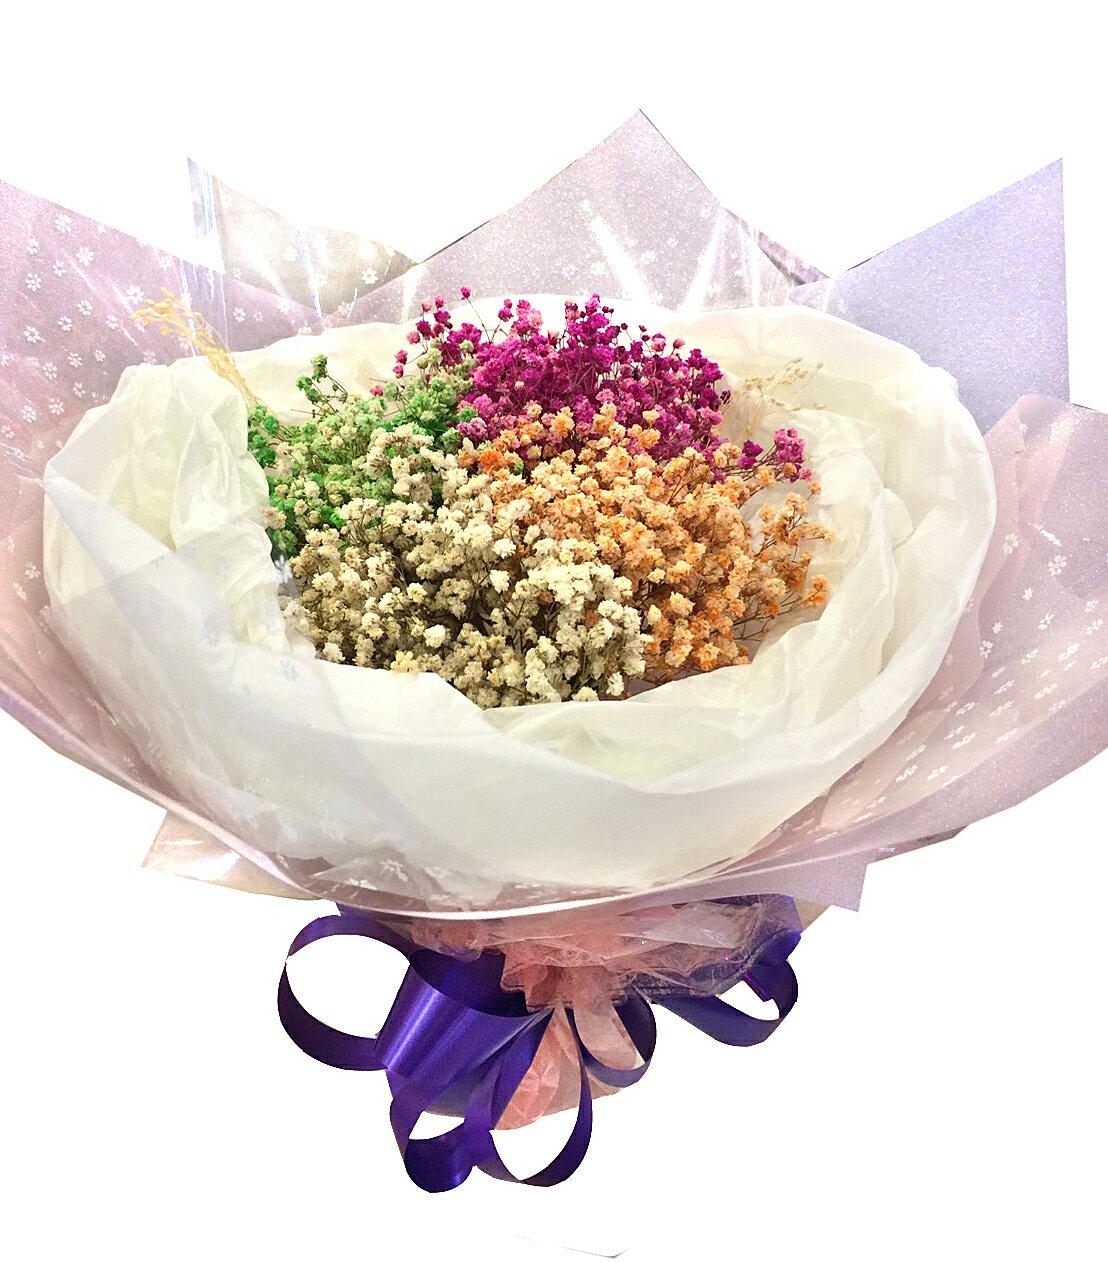 X射線【Y040018】乾燥花束,滿天星/捧花/情人節禮物/婚禮/求婚/送禮/畢業禮物/母親節